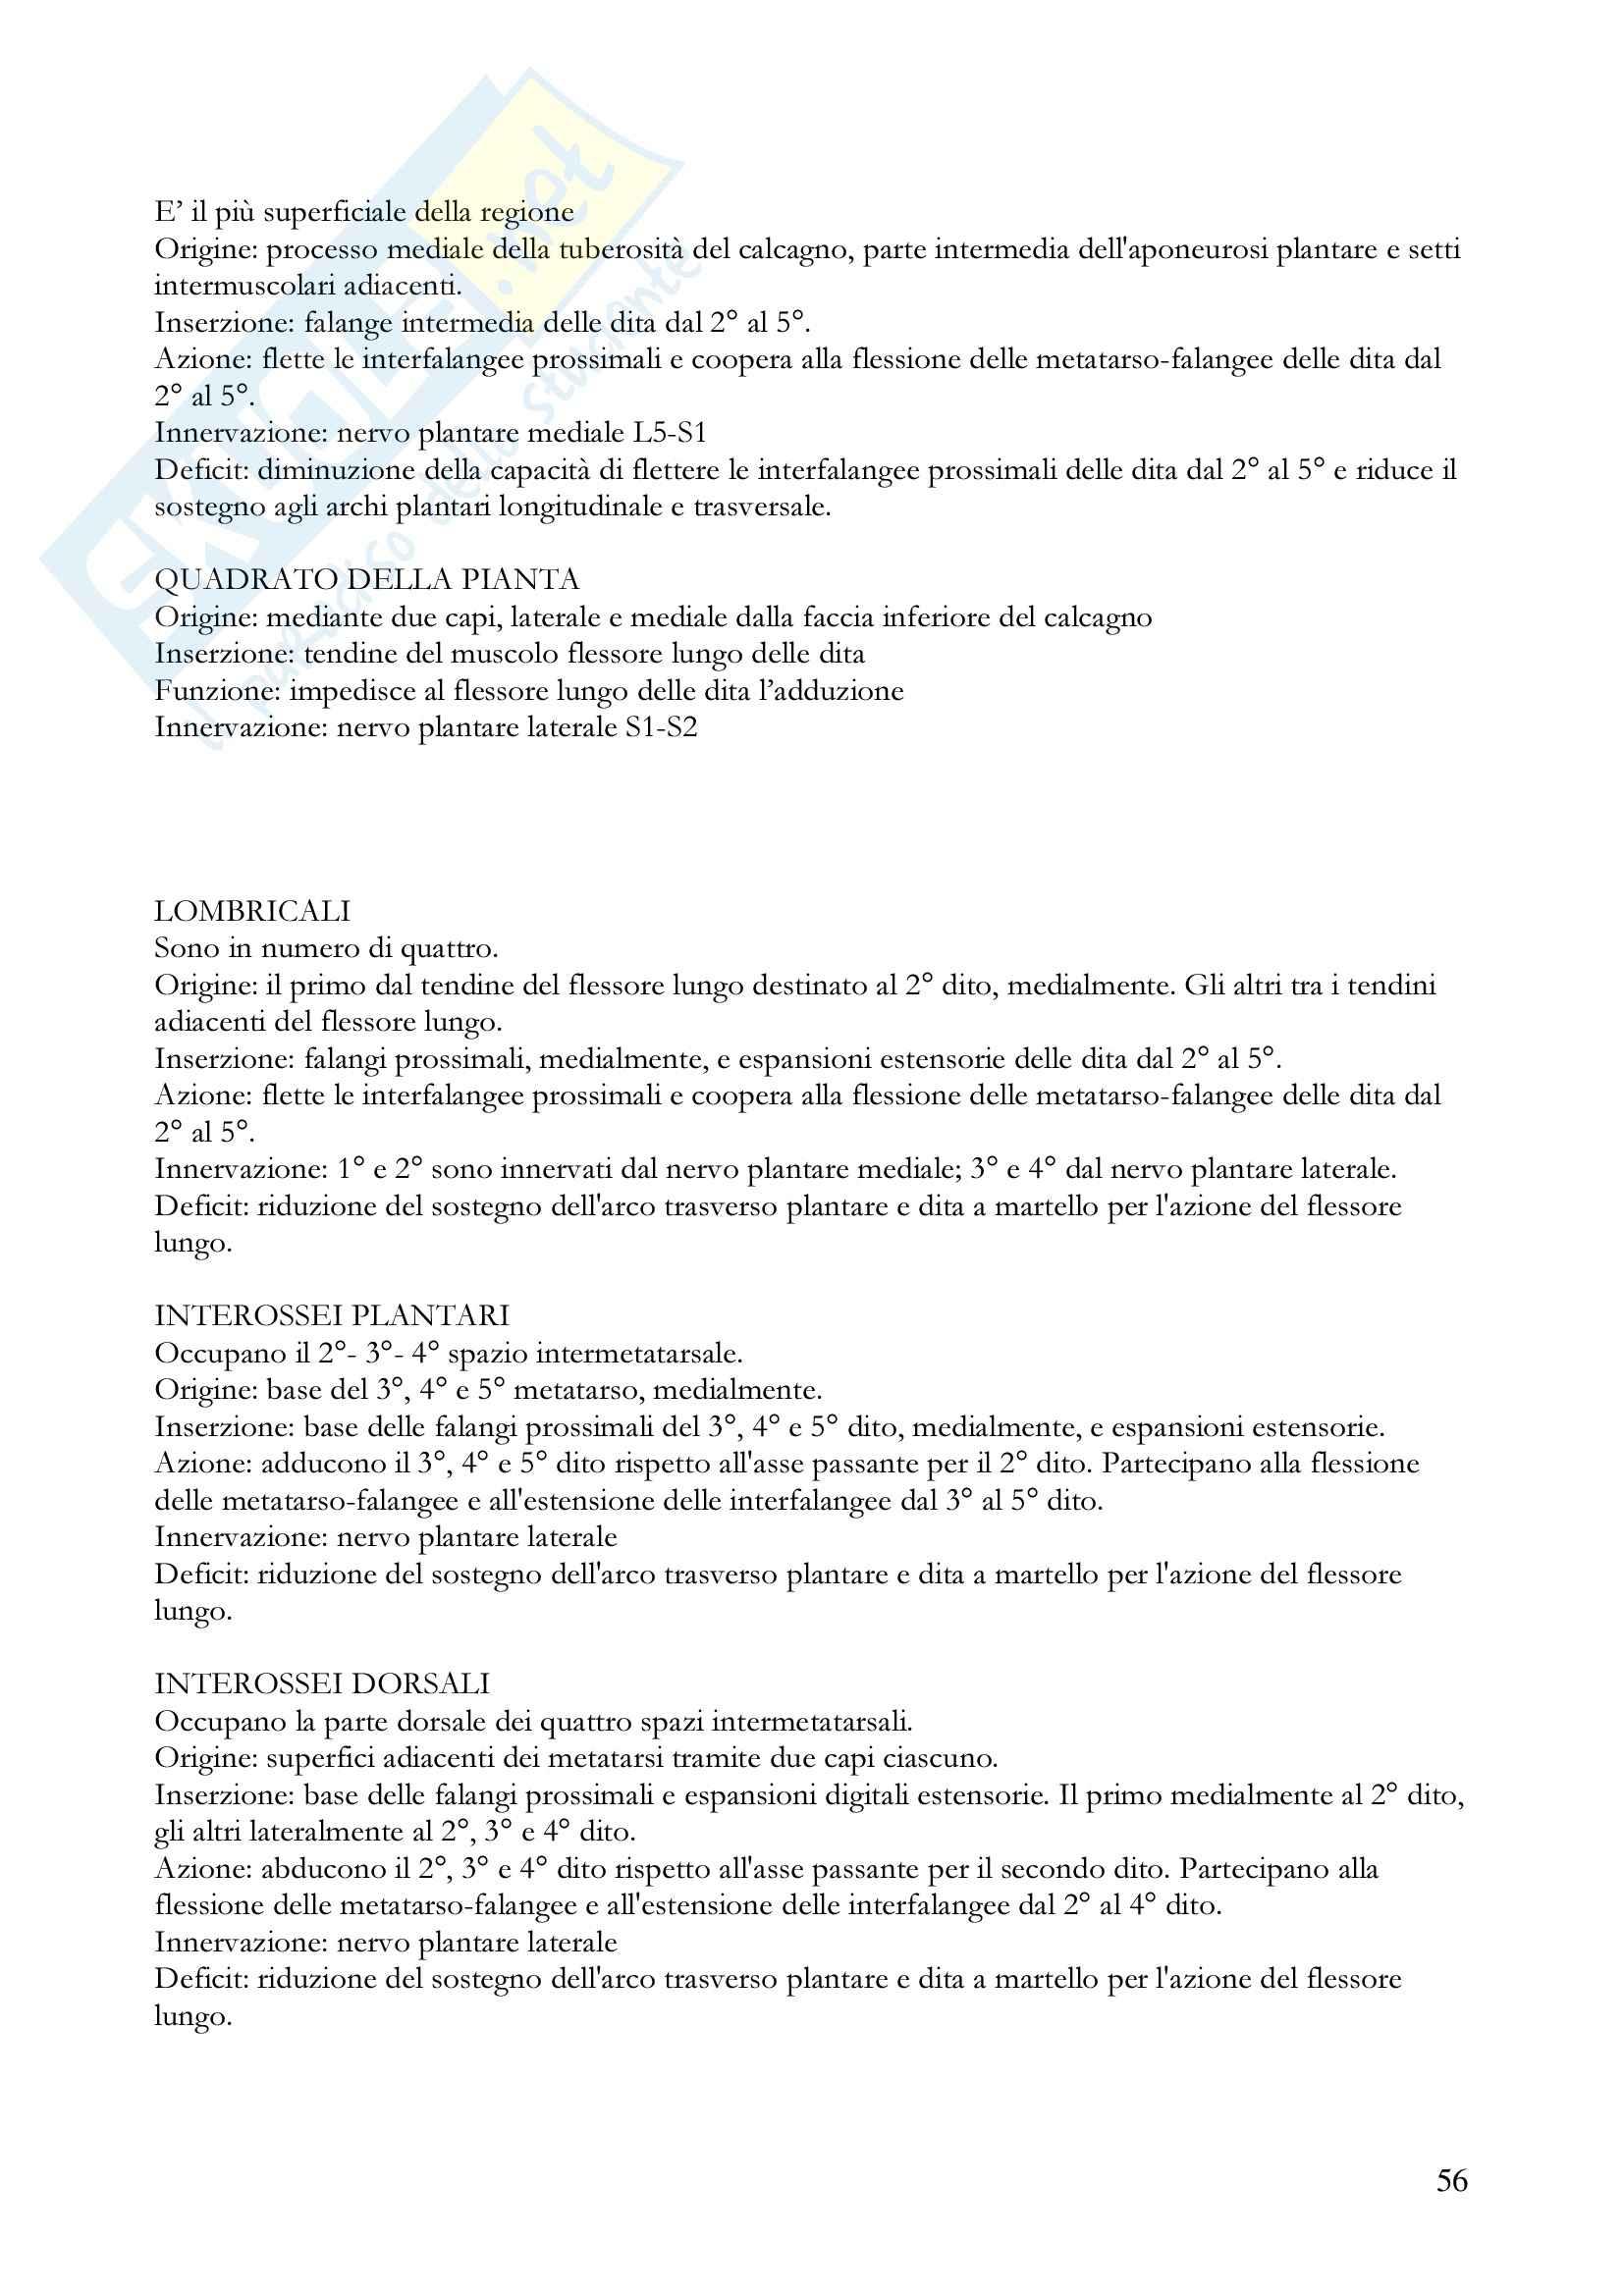 Anatomia umana - apparato locomotore Pag. 56